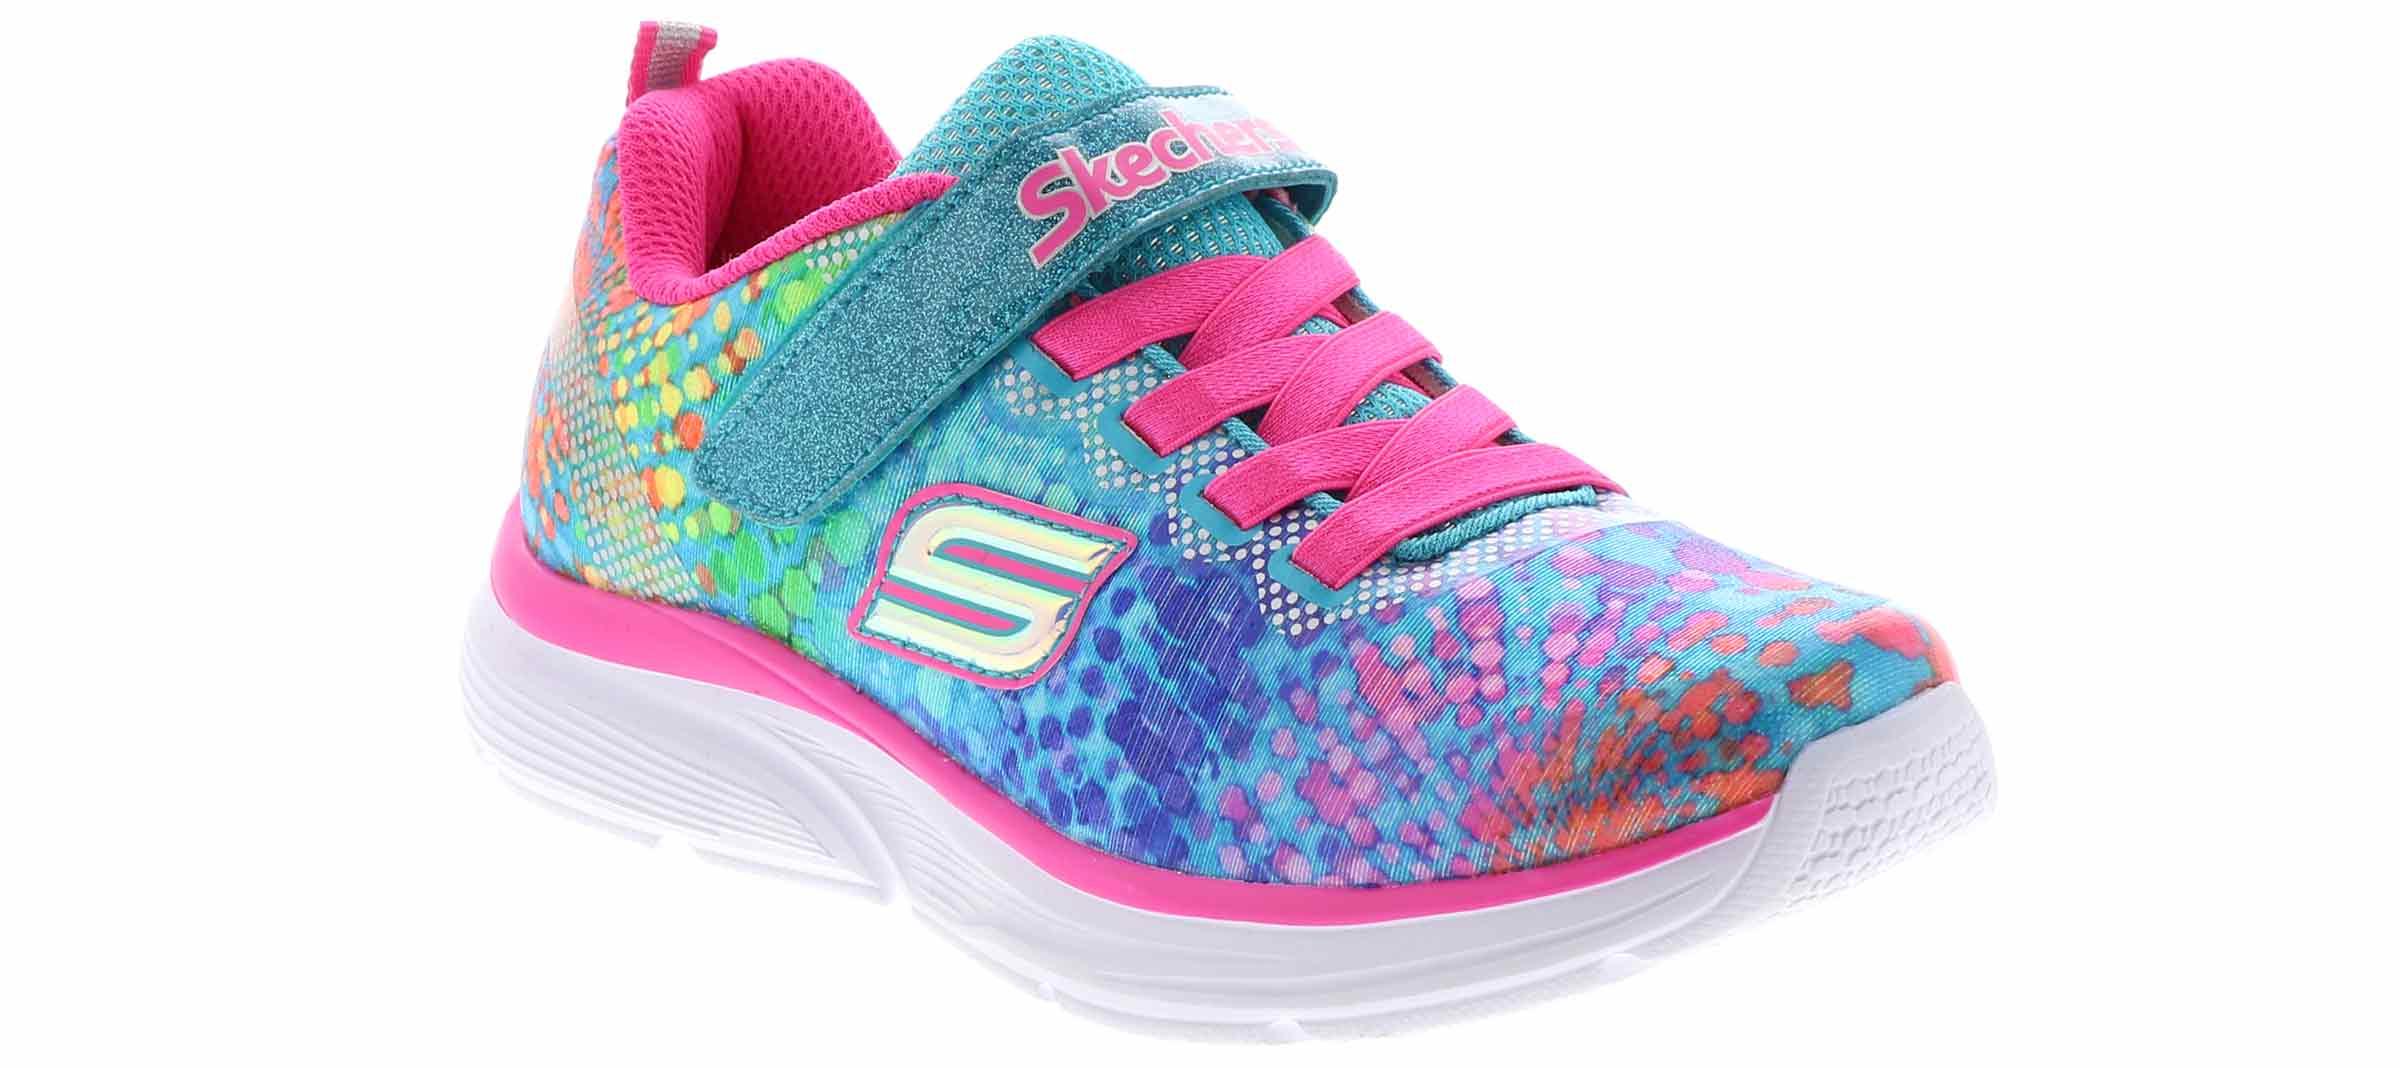 Kid's PUMA SMASH V2 CONFETTI V INF Black Shoe Sensation  Shoe Sensation